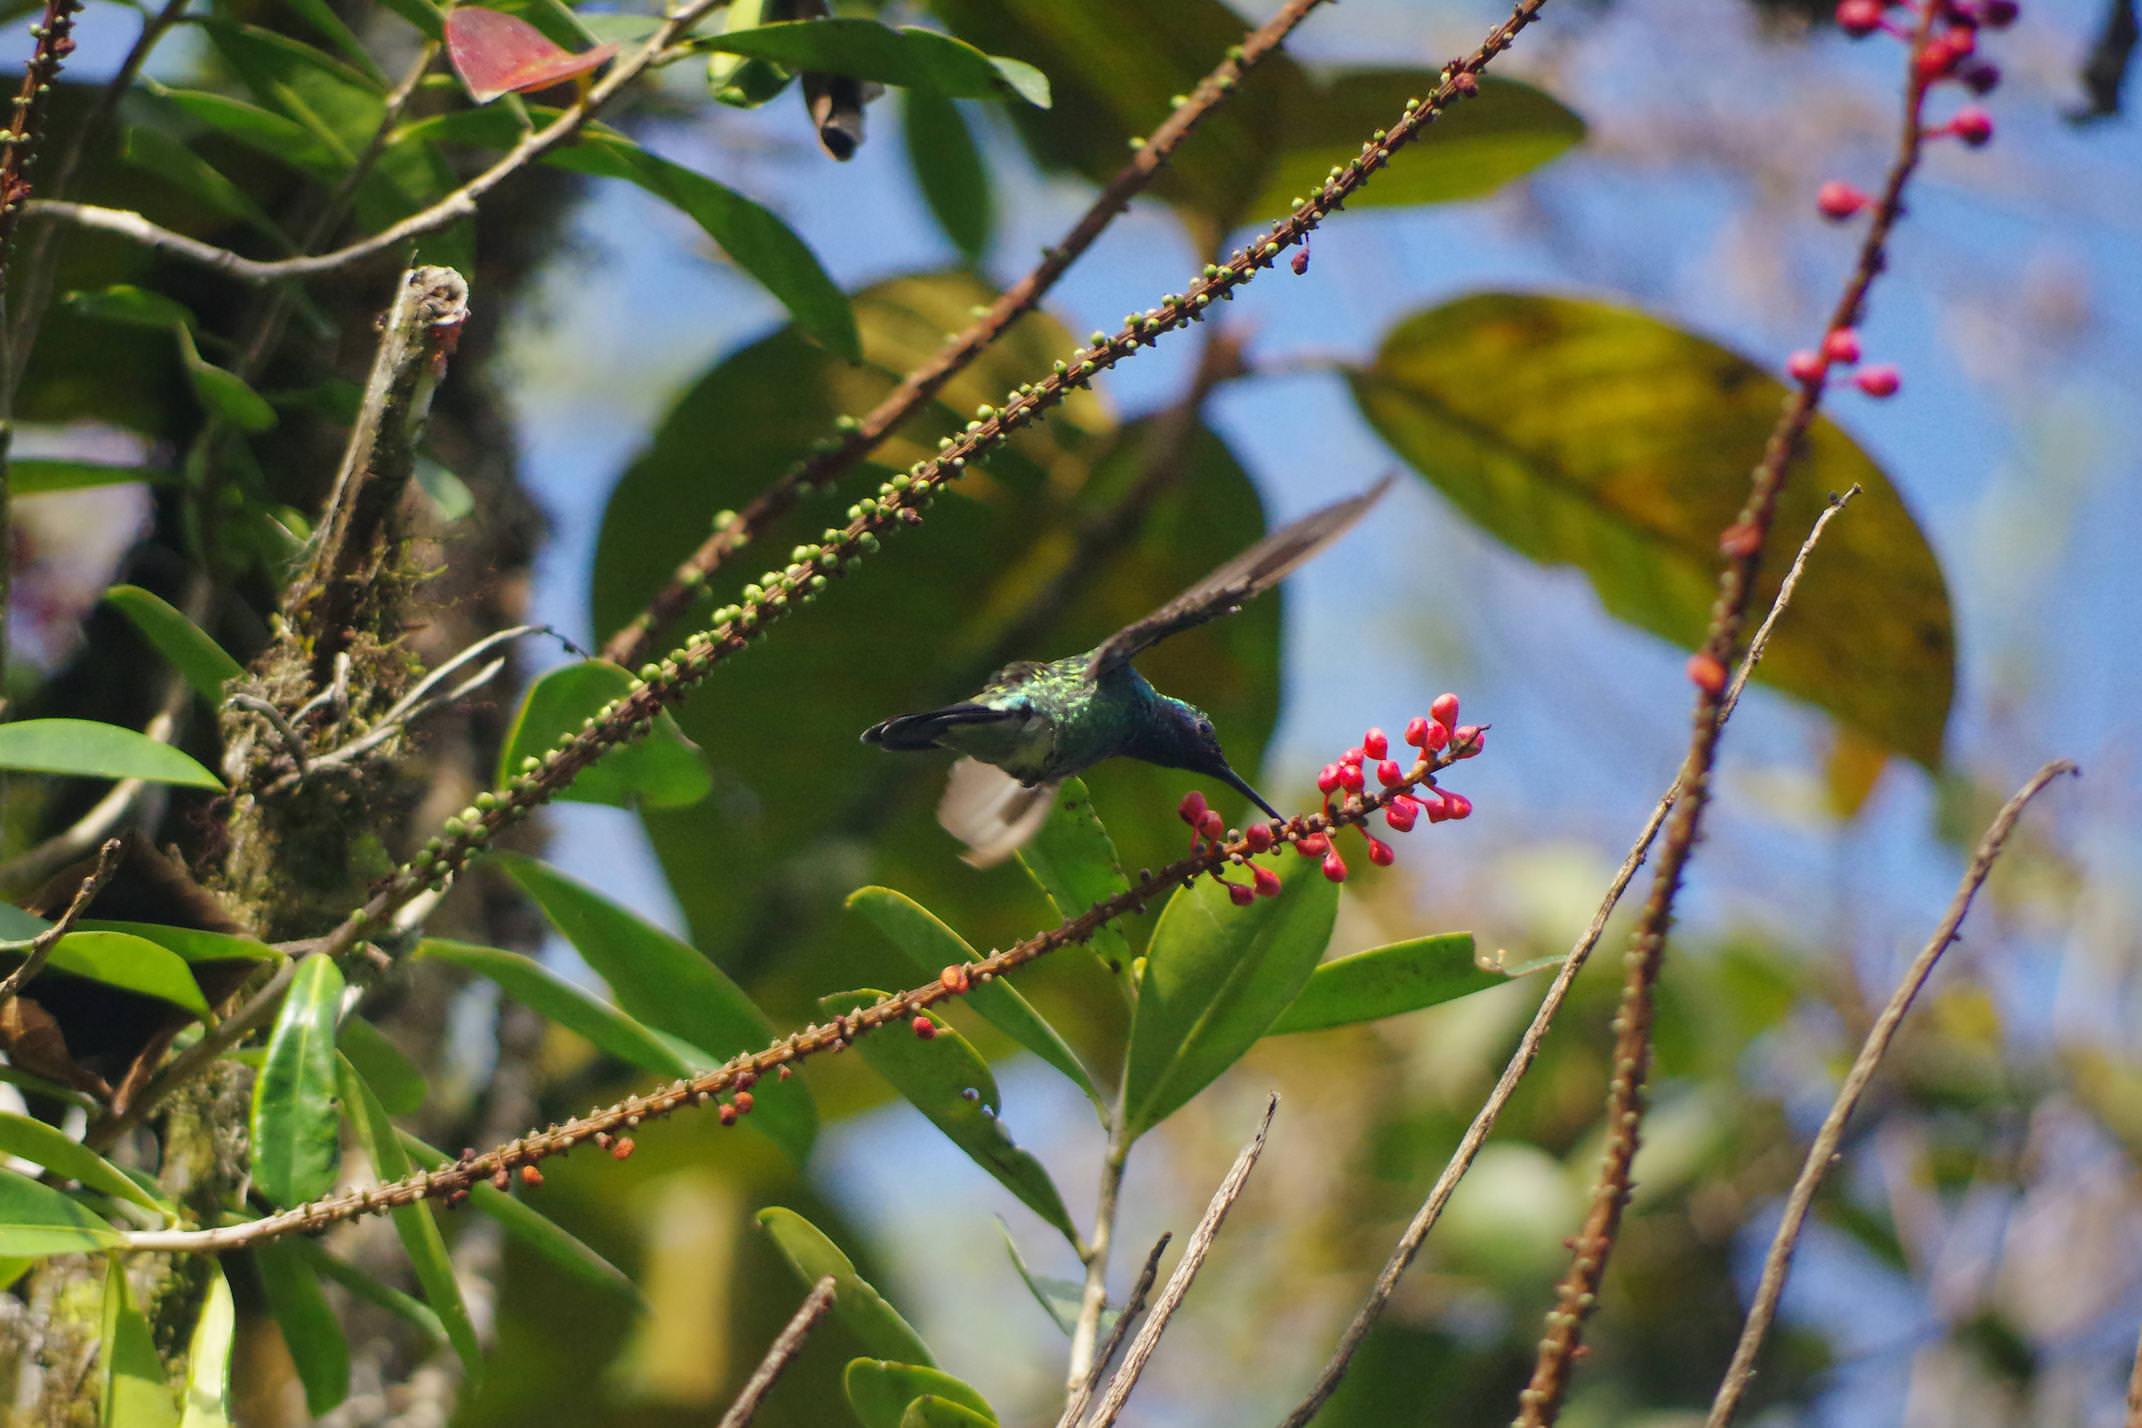 Ecuador mindo hummingbird 2 chris bladon